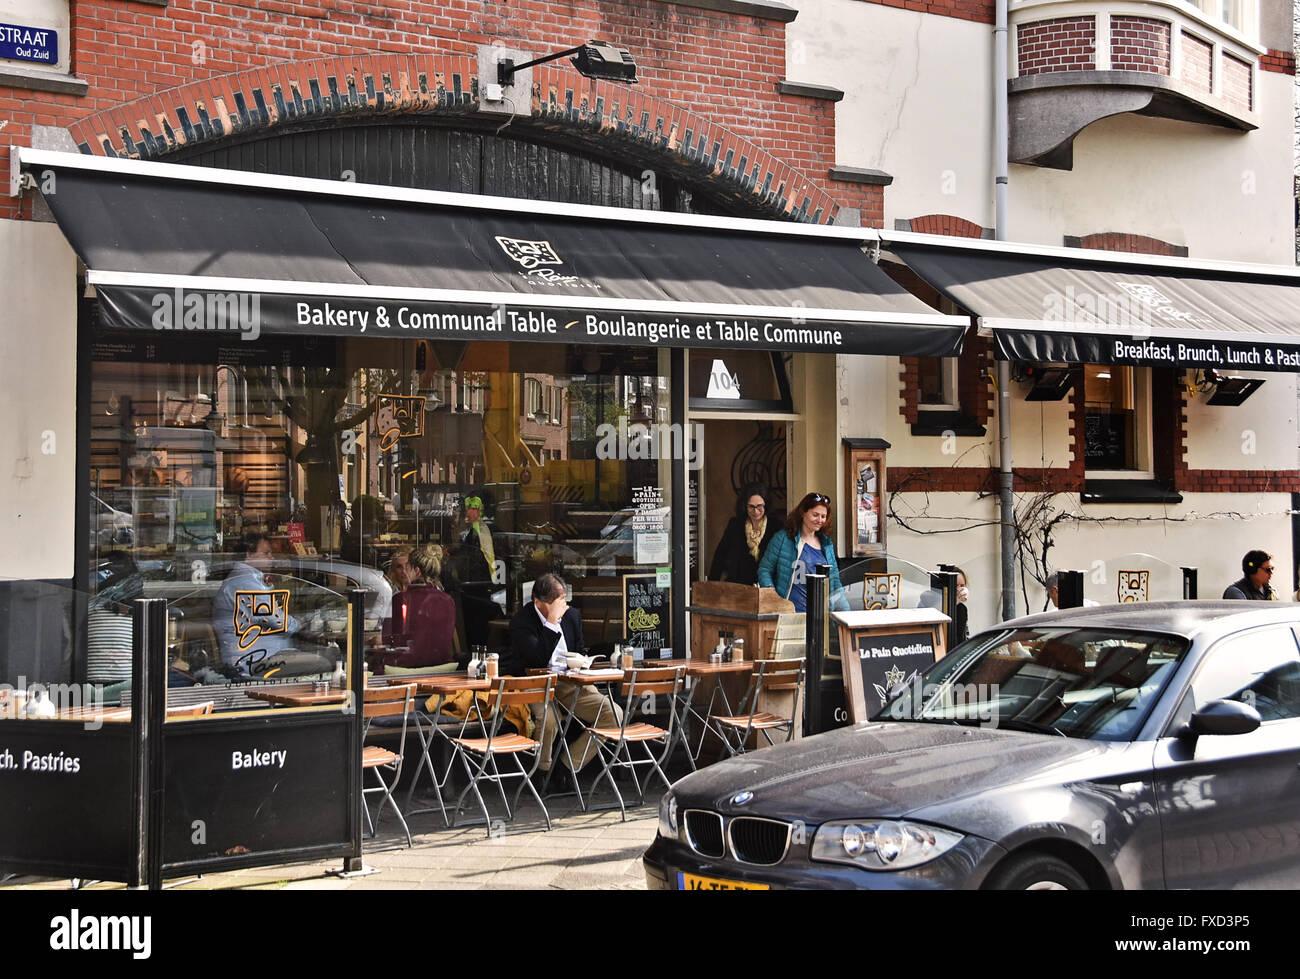 Le Pain Quotidien ( Bakery & Communal  Table ) Cornelis Schuytstraat  Oud Zuid Amsterdam   Dutch Netherlands Stock Photo